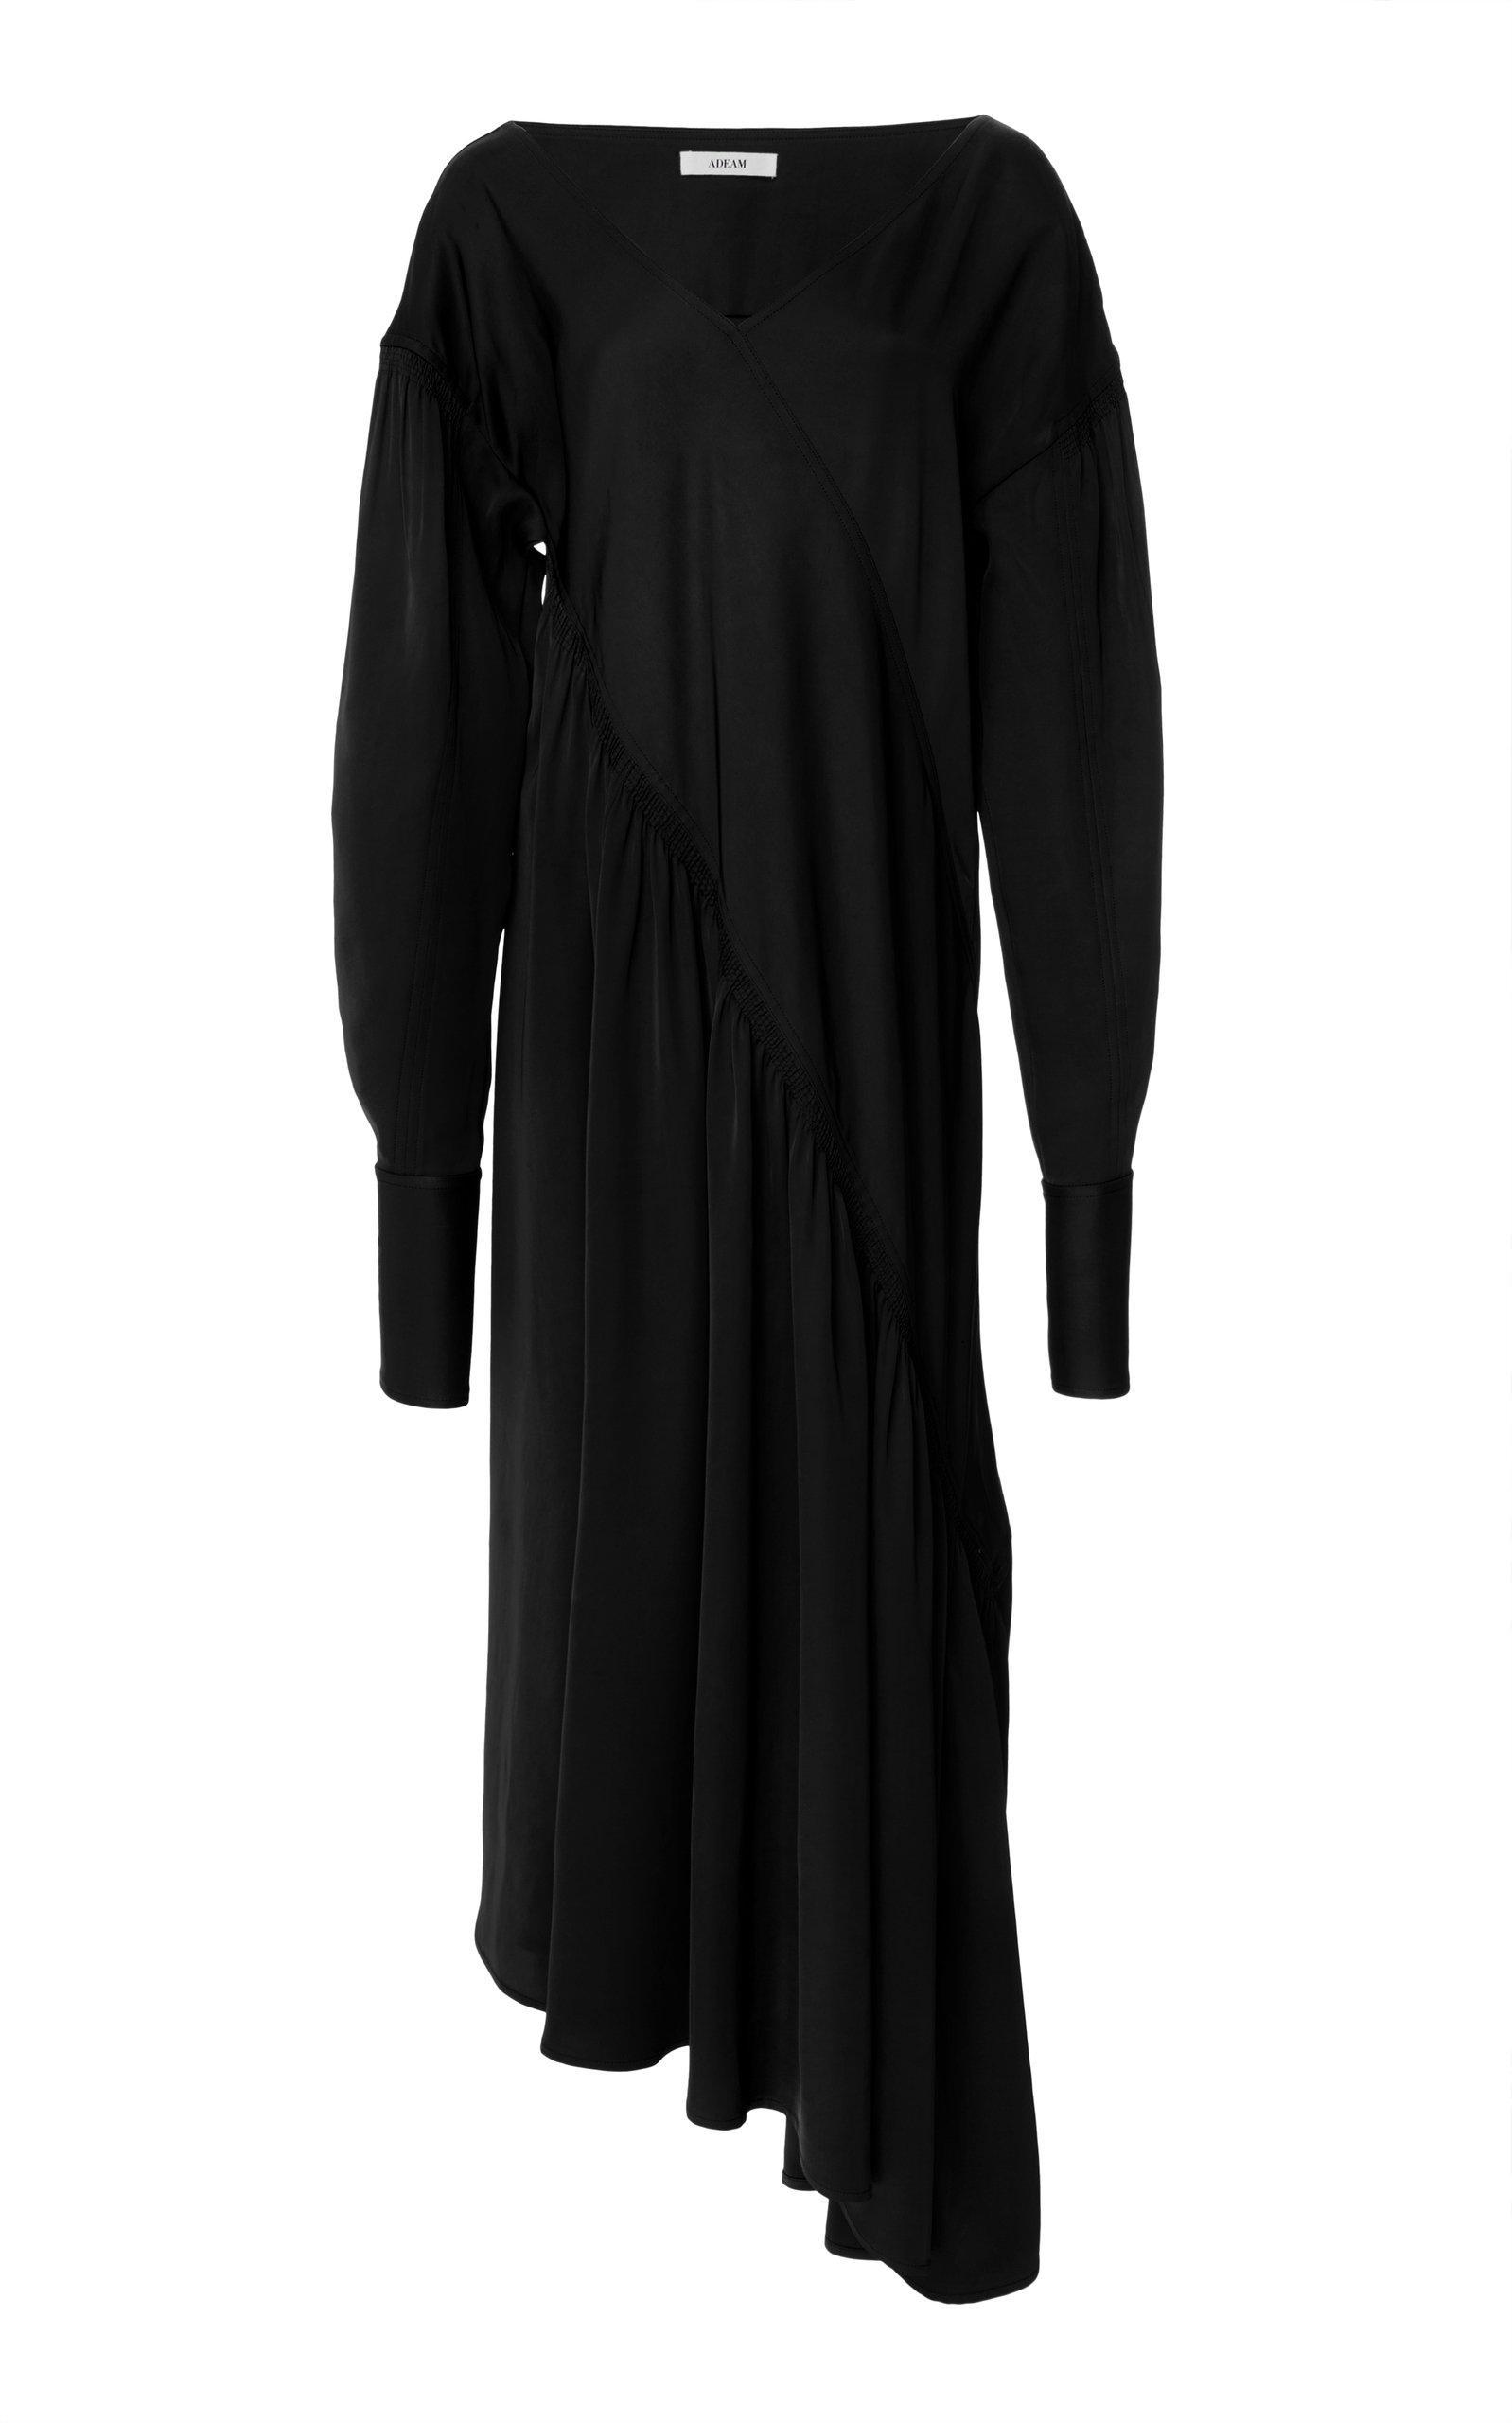 Adeam Bias Ruched Dress In Black